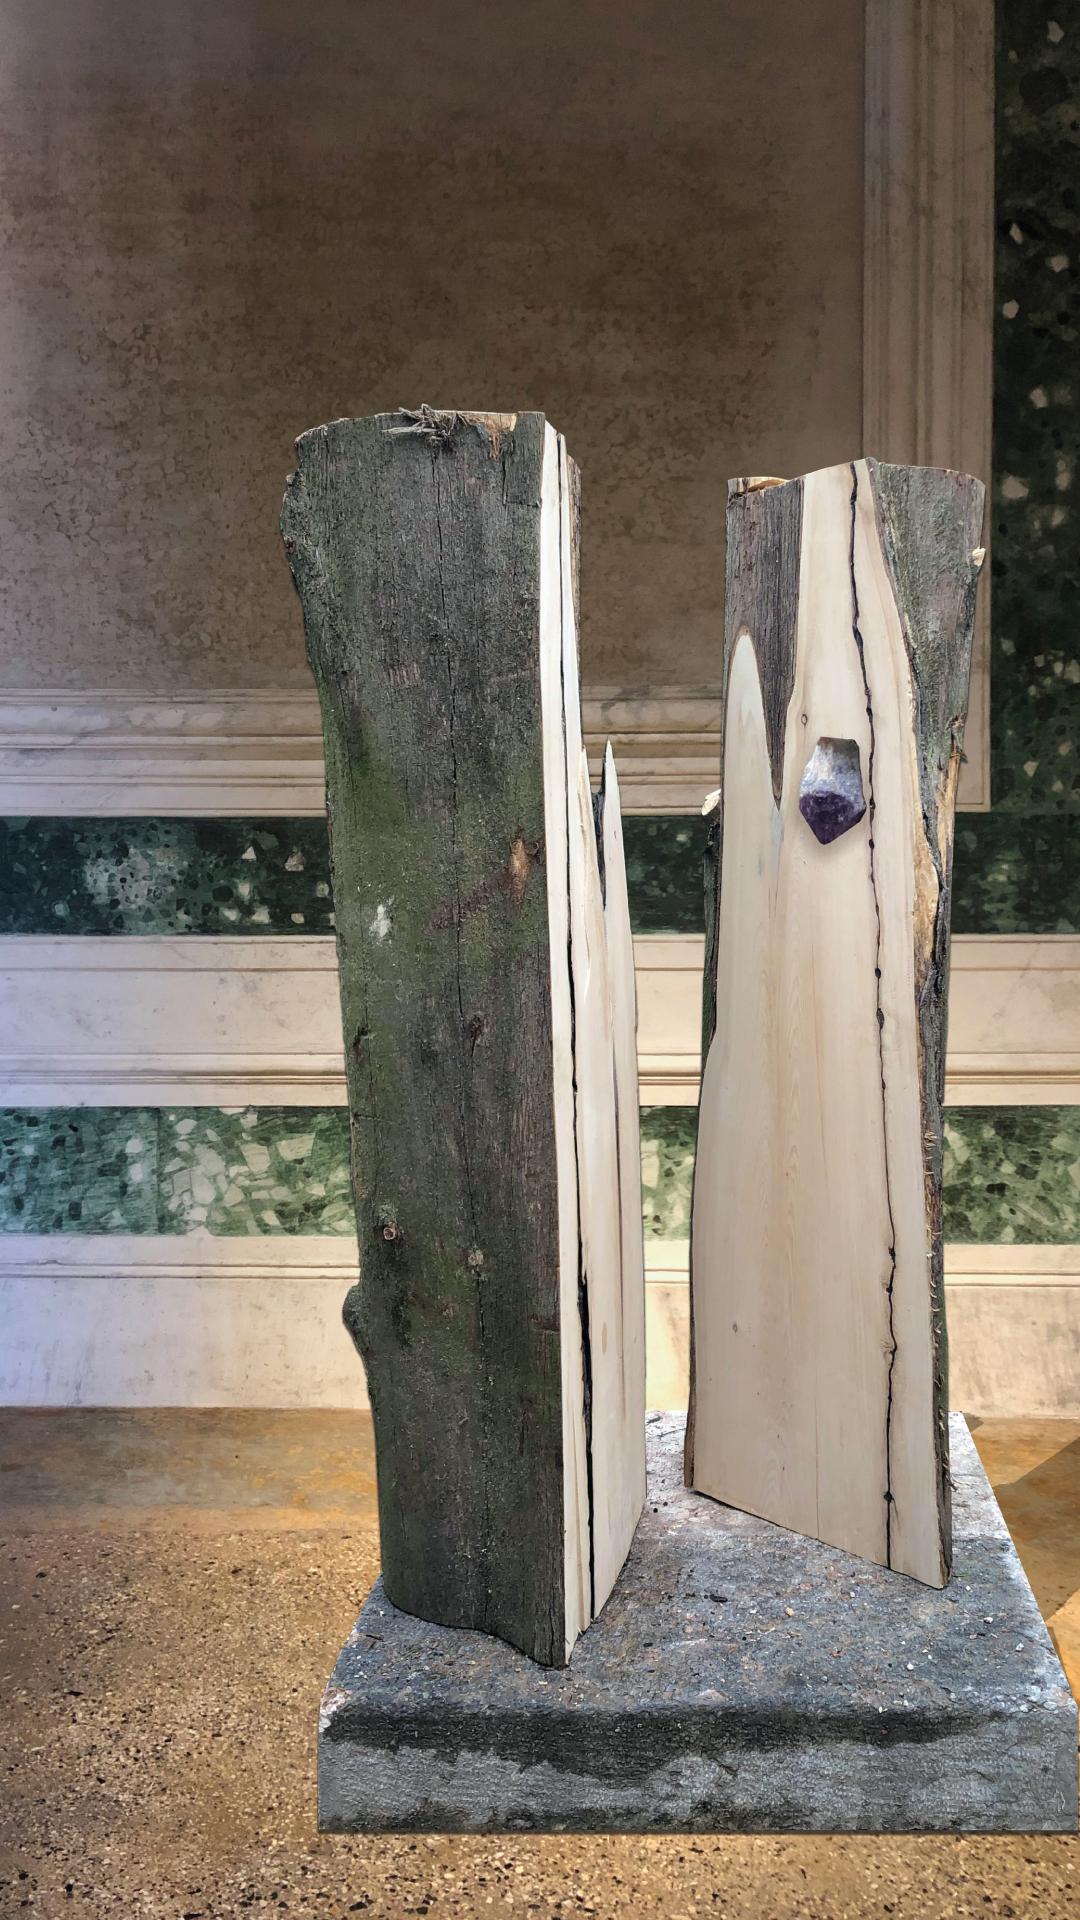 02-THERAW-THECOOKED-AARON-NACHTAILER-ART-ARTIST-CRYSTALS-SCULPTURES-VERTICAL